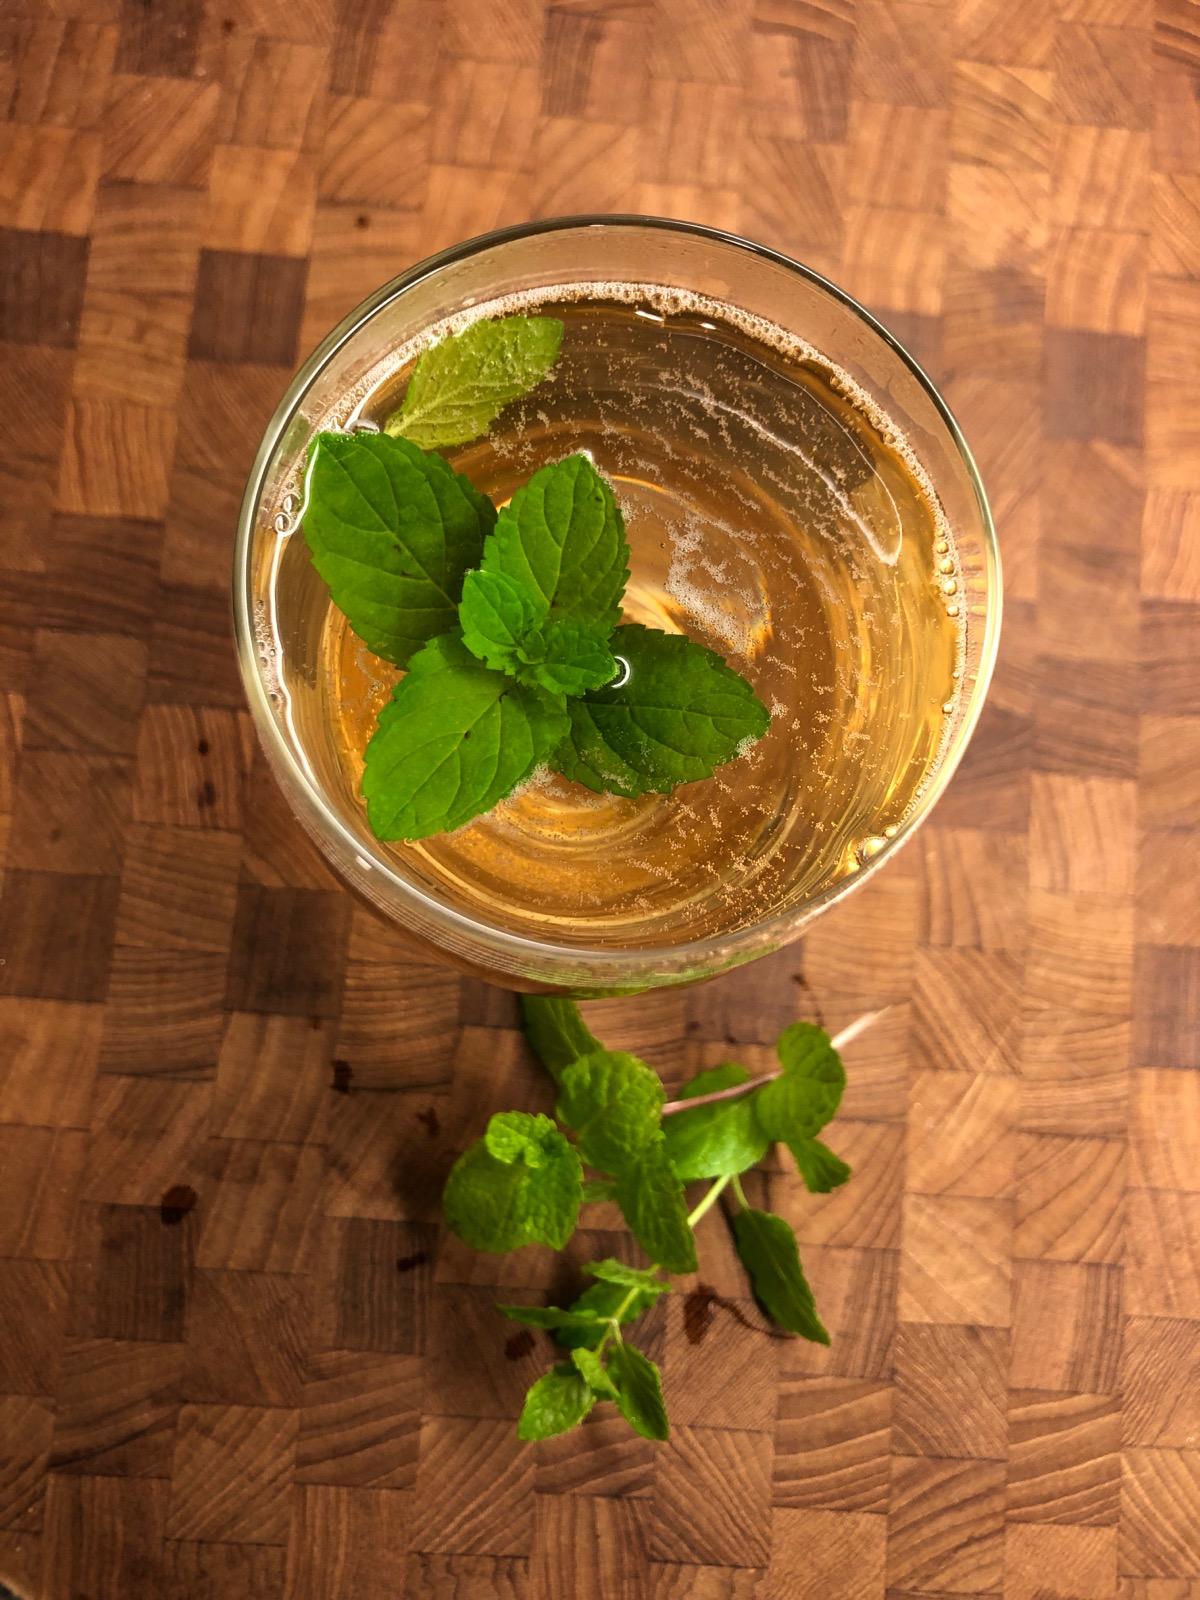 Sekanjabin (Iranian Mint Vinegar Syrup)